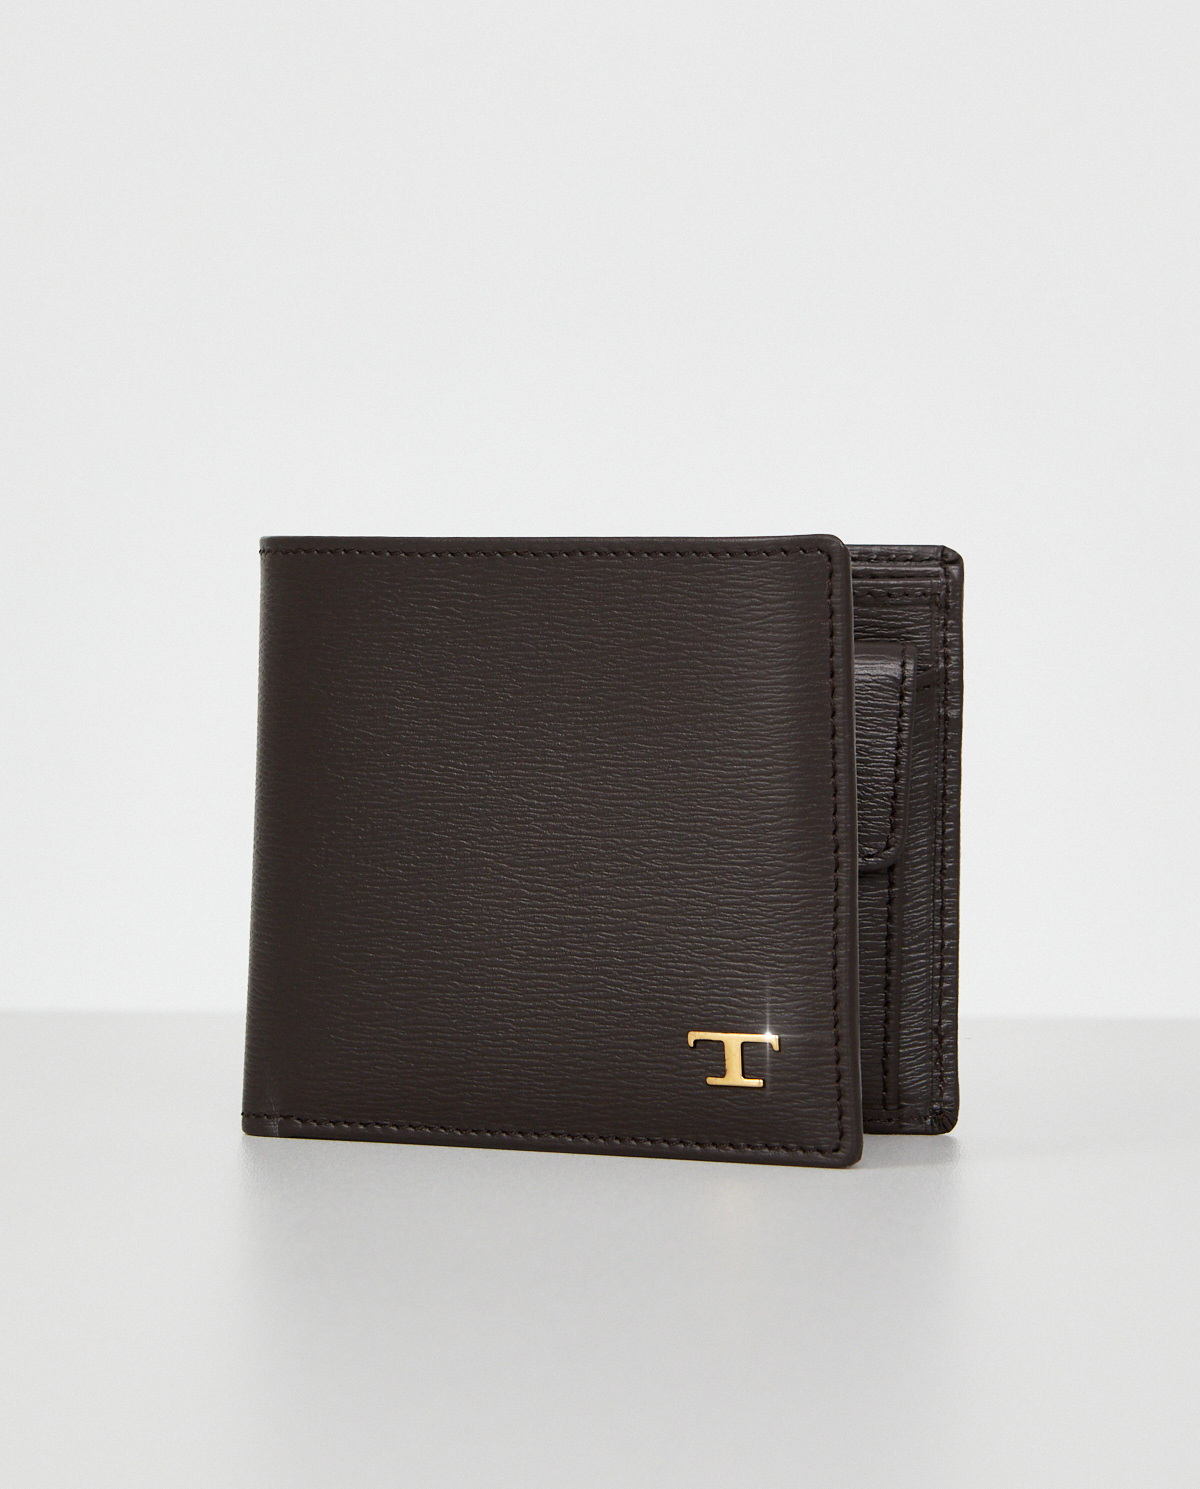 Brązowy portfel z monogramem Tod's XAMTSIBB300VIBS810